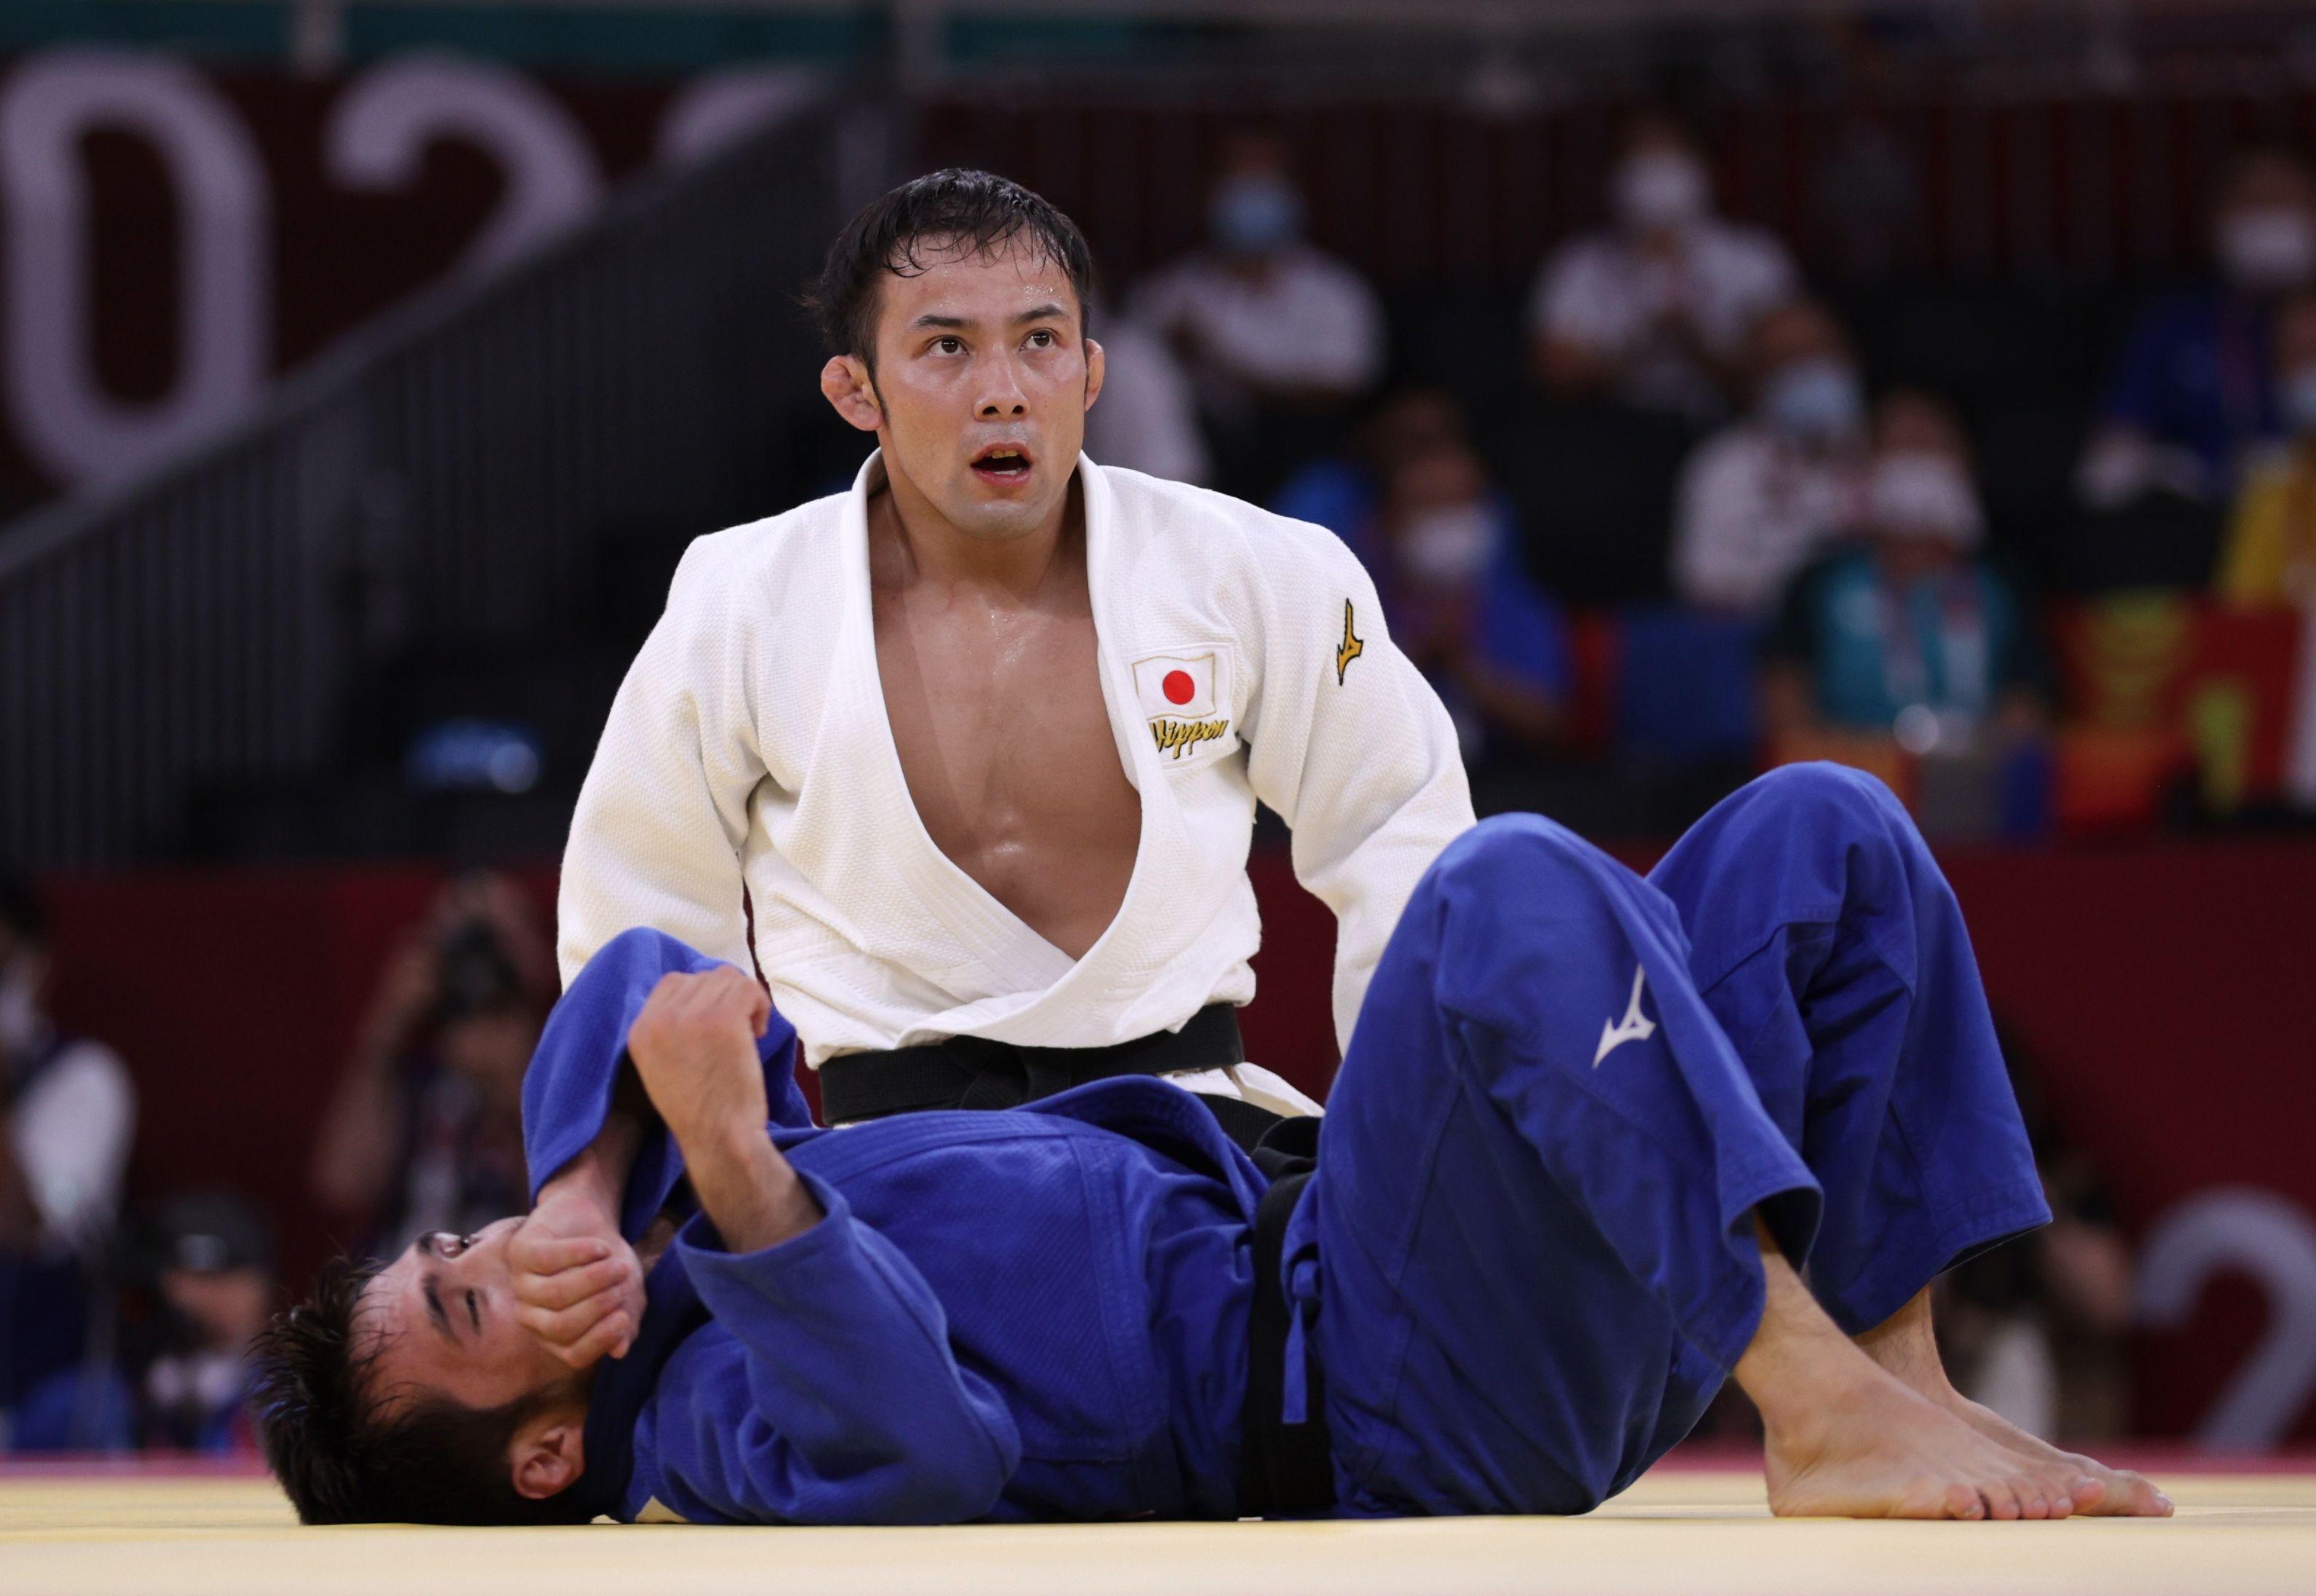 Tokyo 2020 Olympics - Judo - Men's 60kg - Semifinal - Nippon Budokan - Tokyo, Japan - July 24, 2021. Naohisa Takato of Japan reacts after performing the winning move against Yeldos Smetov of Kazakhstan REUTERS/Hannah Mckay